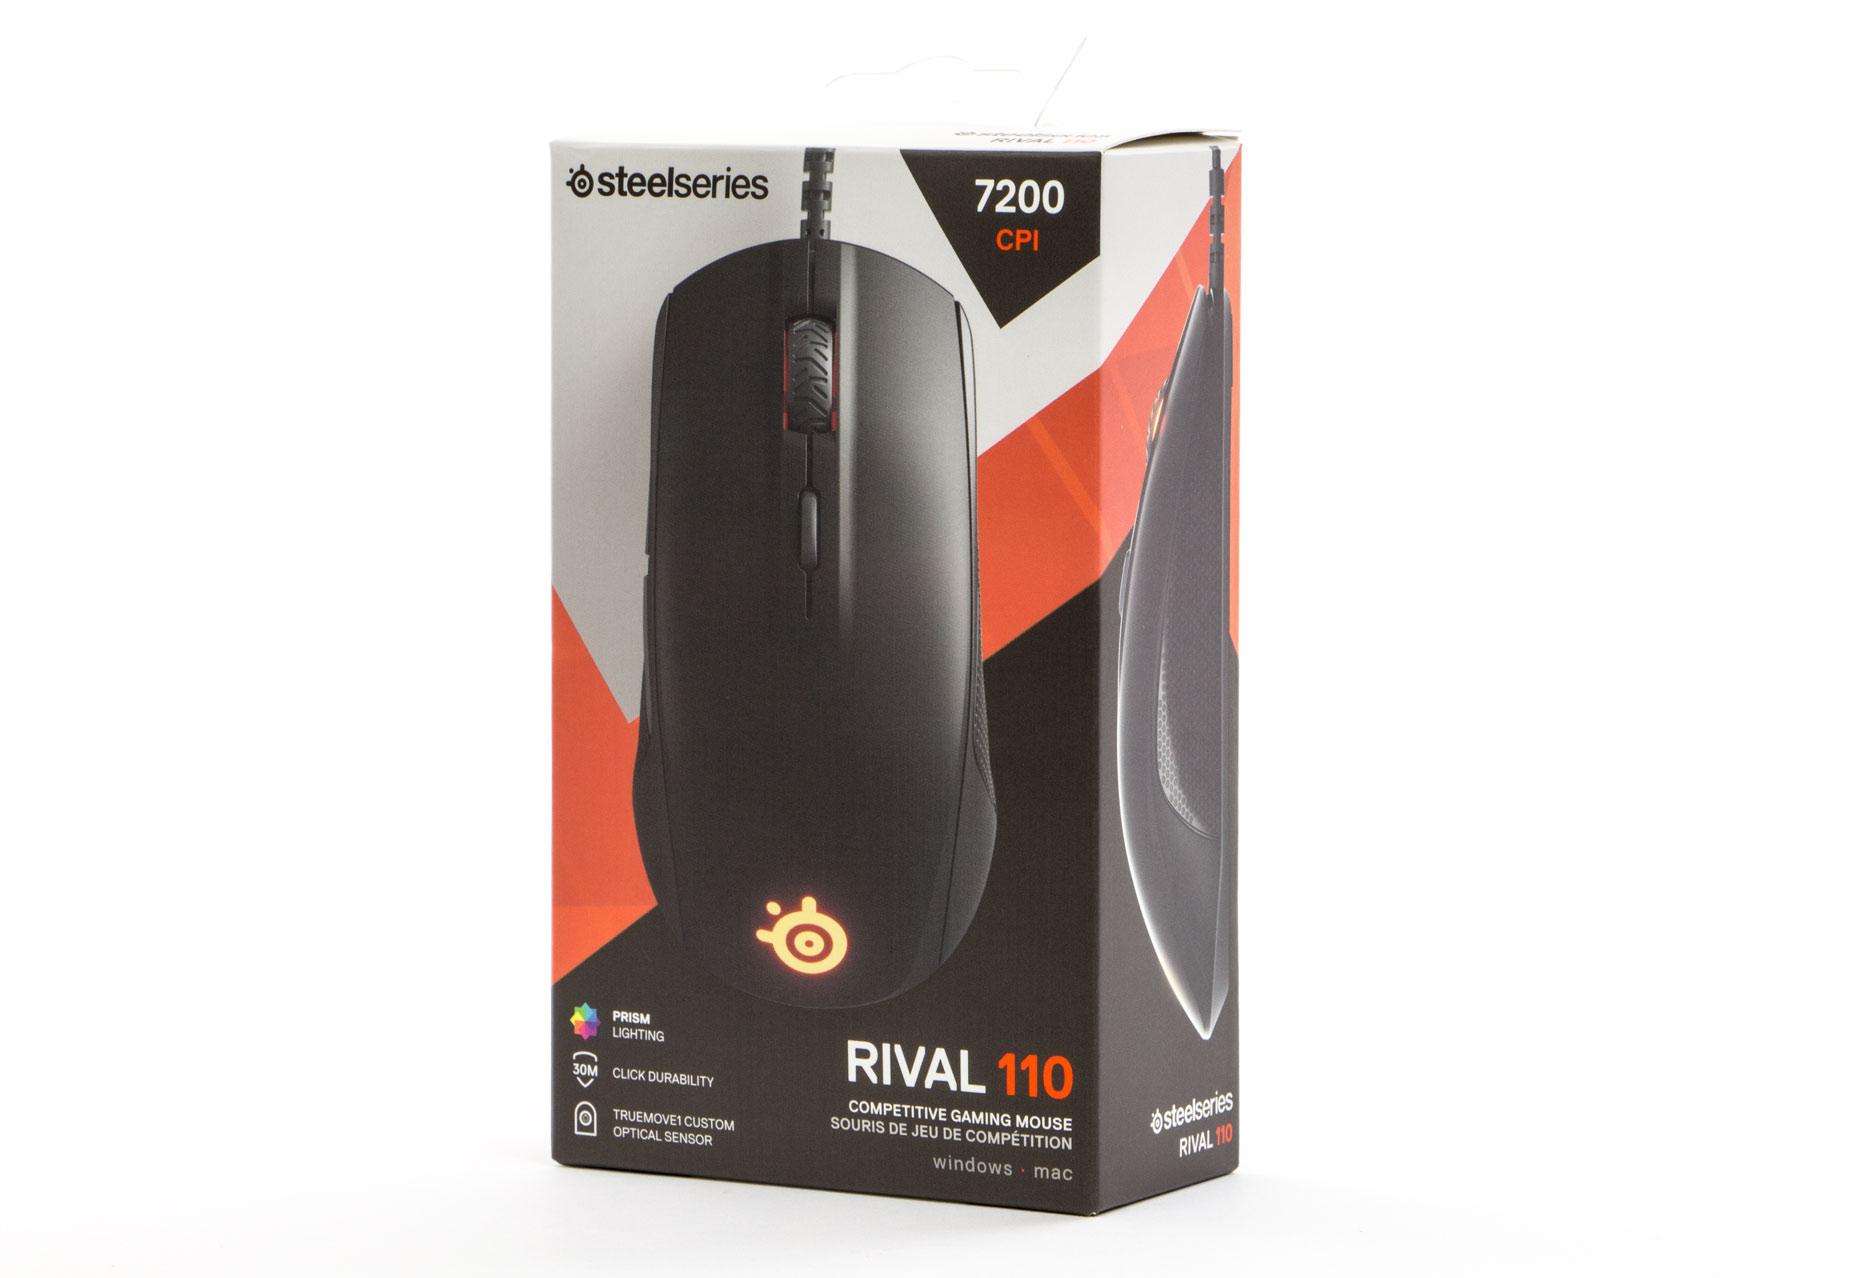 SteelSeries Rival 110 - pudełko z myszką